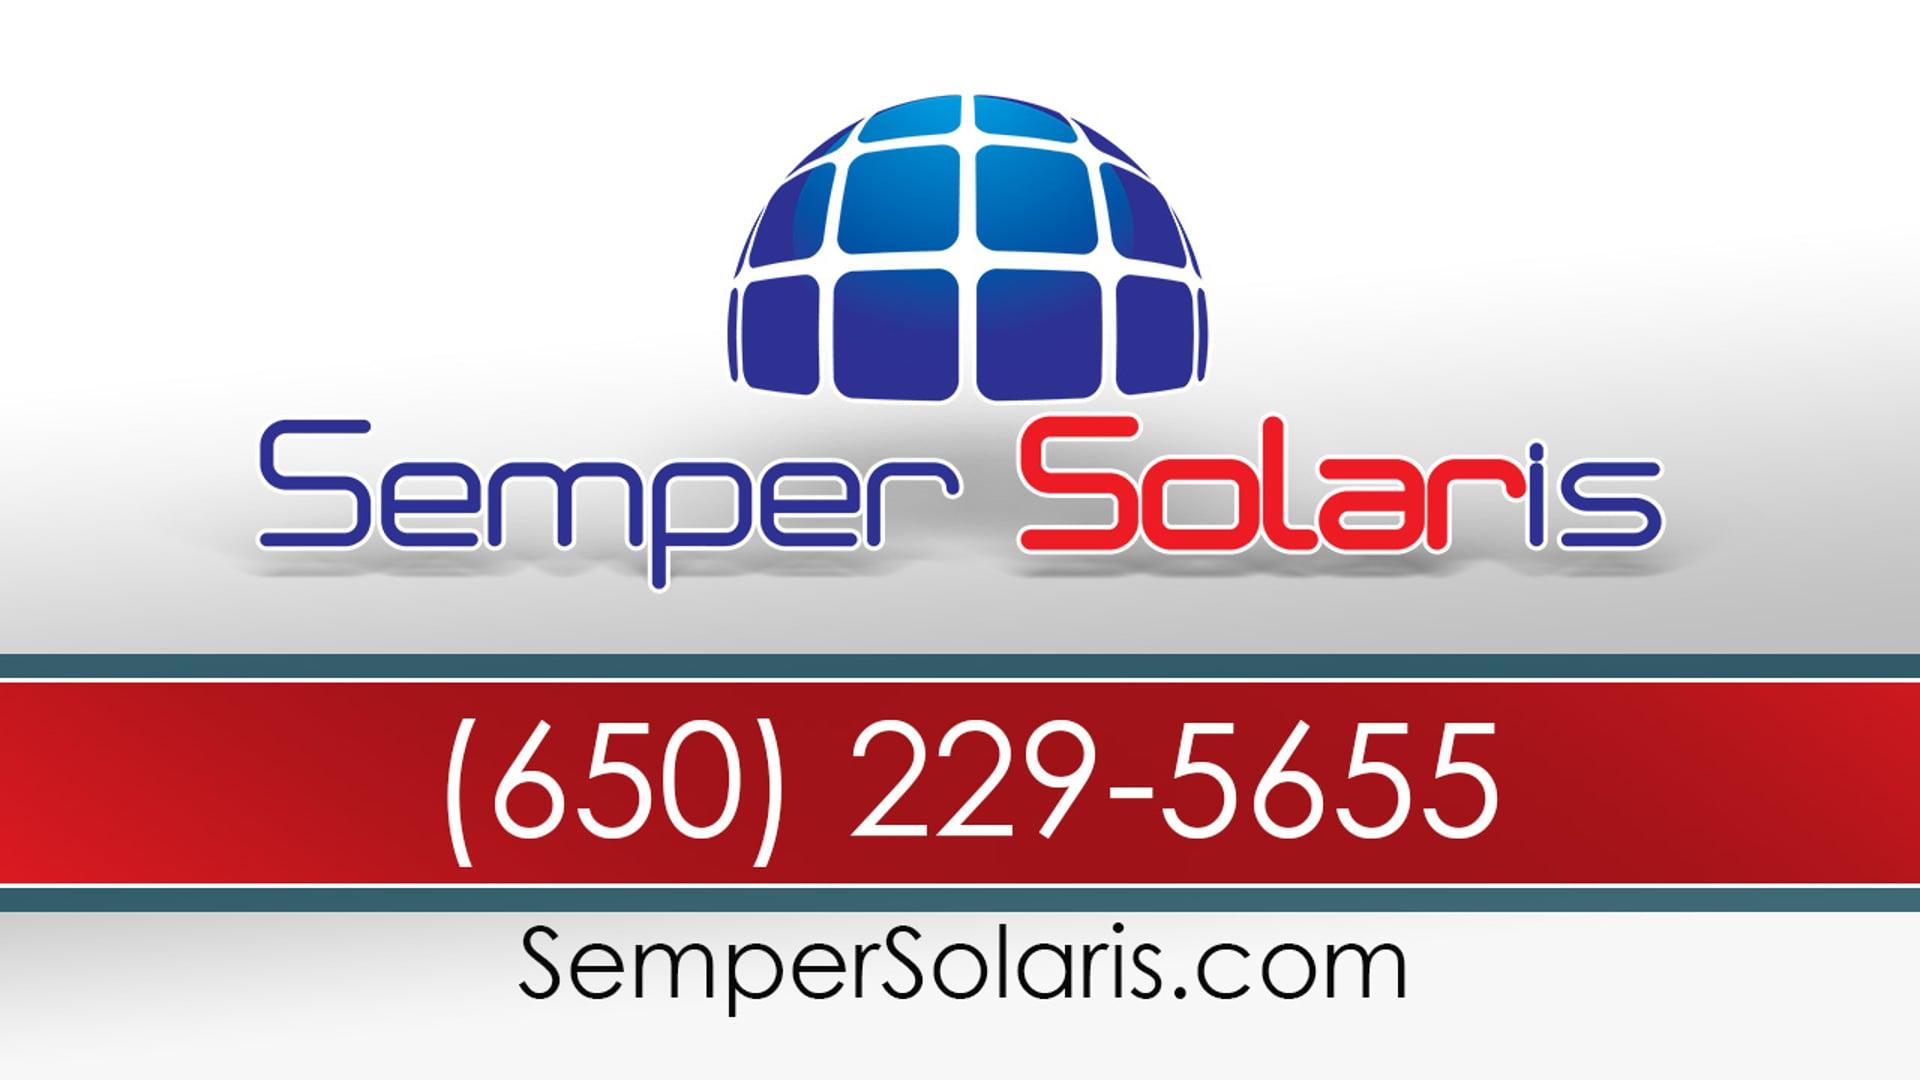 San Francisco Solar Service Provider | Semper Solaris | (650) 229-5655